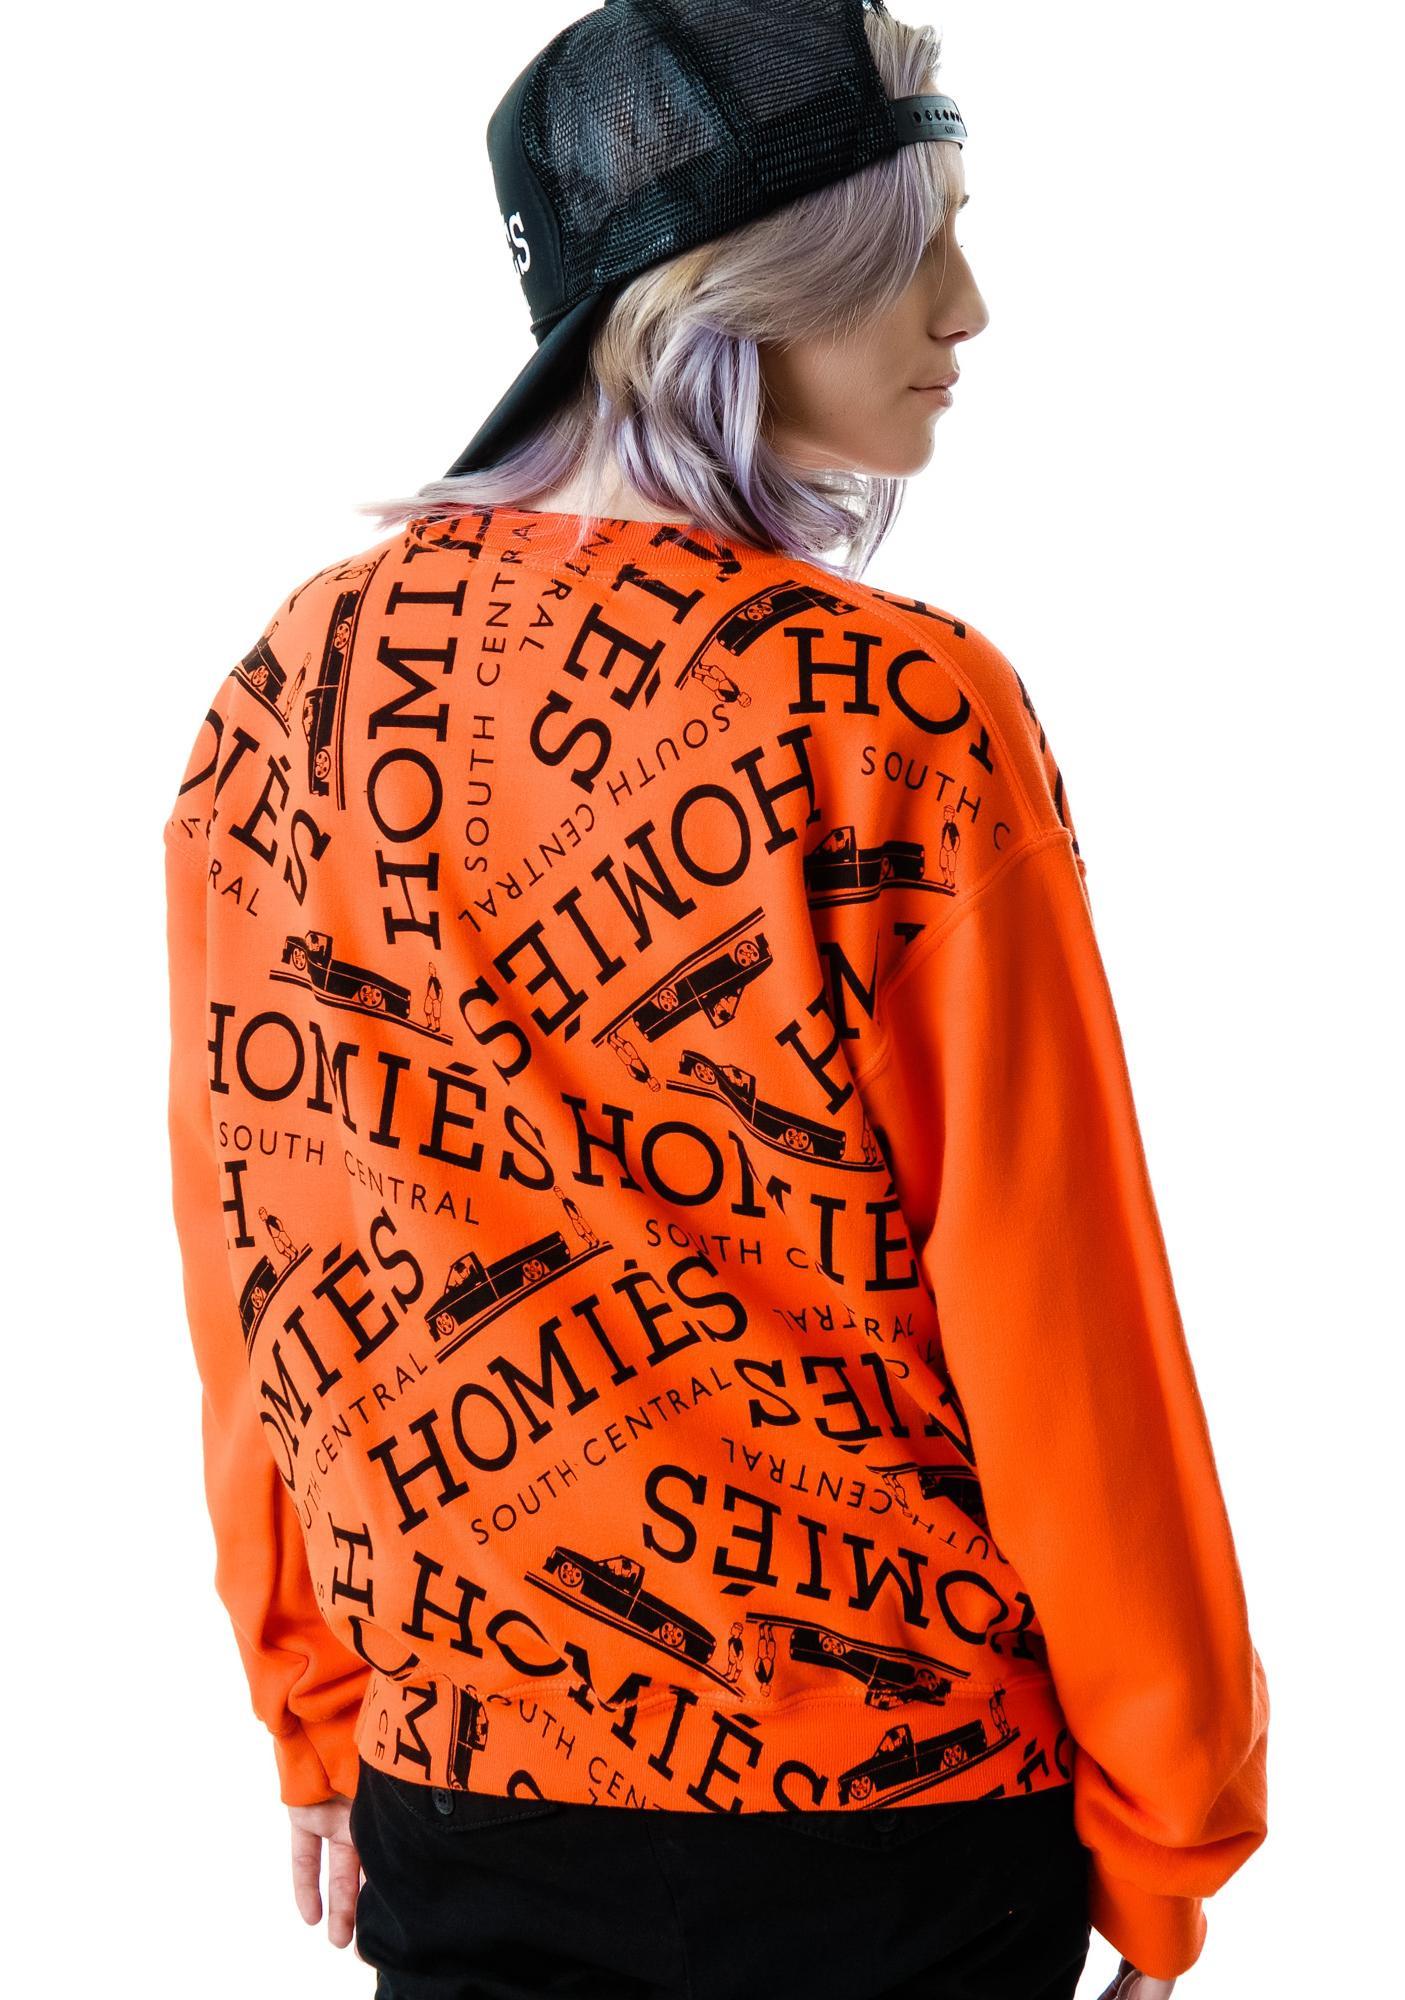 Brian Lichtenberg Homies Graffiti Sweatshirt